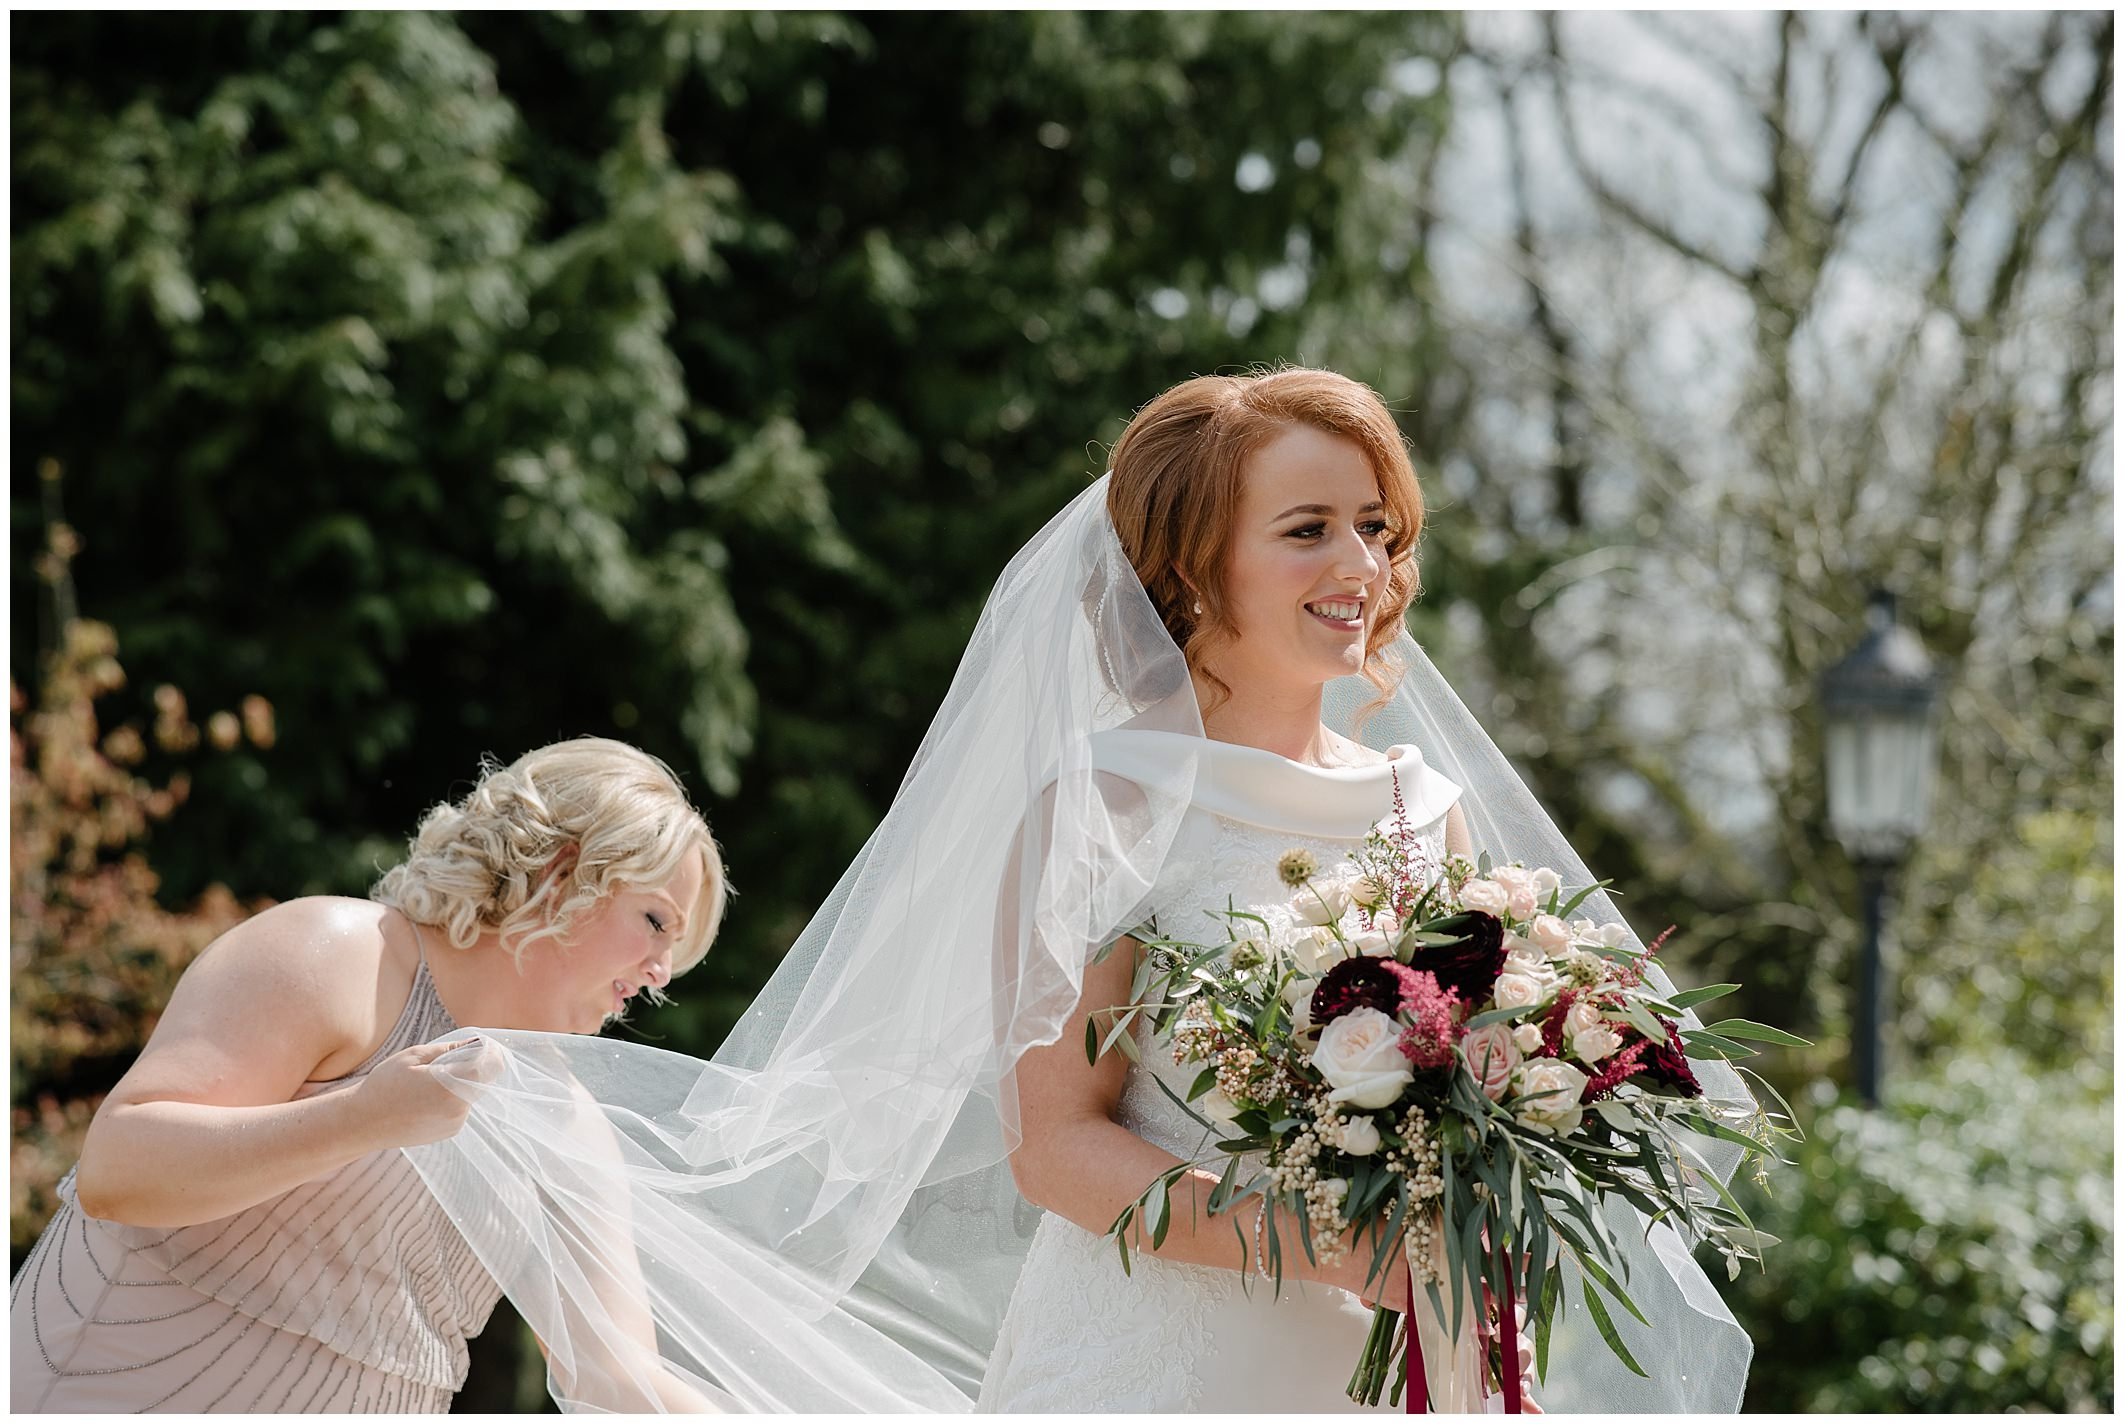 corick-house-wedding-hannah-gary-jude-browne-photography_0026.jpg